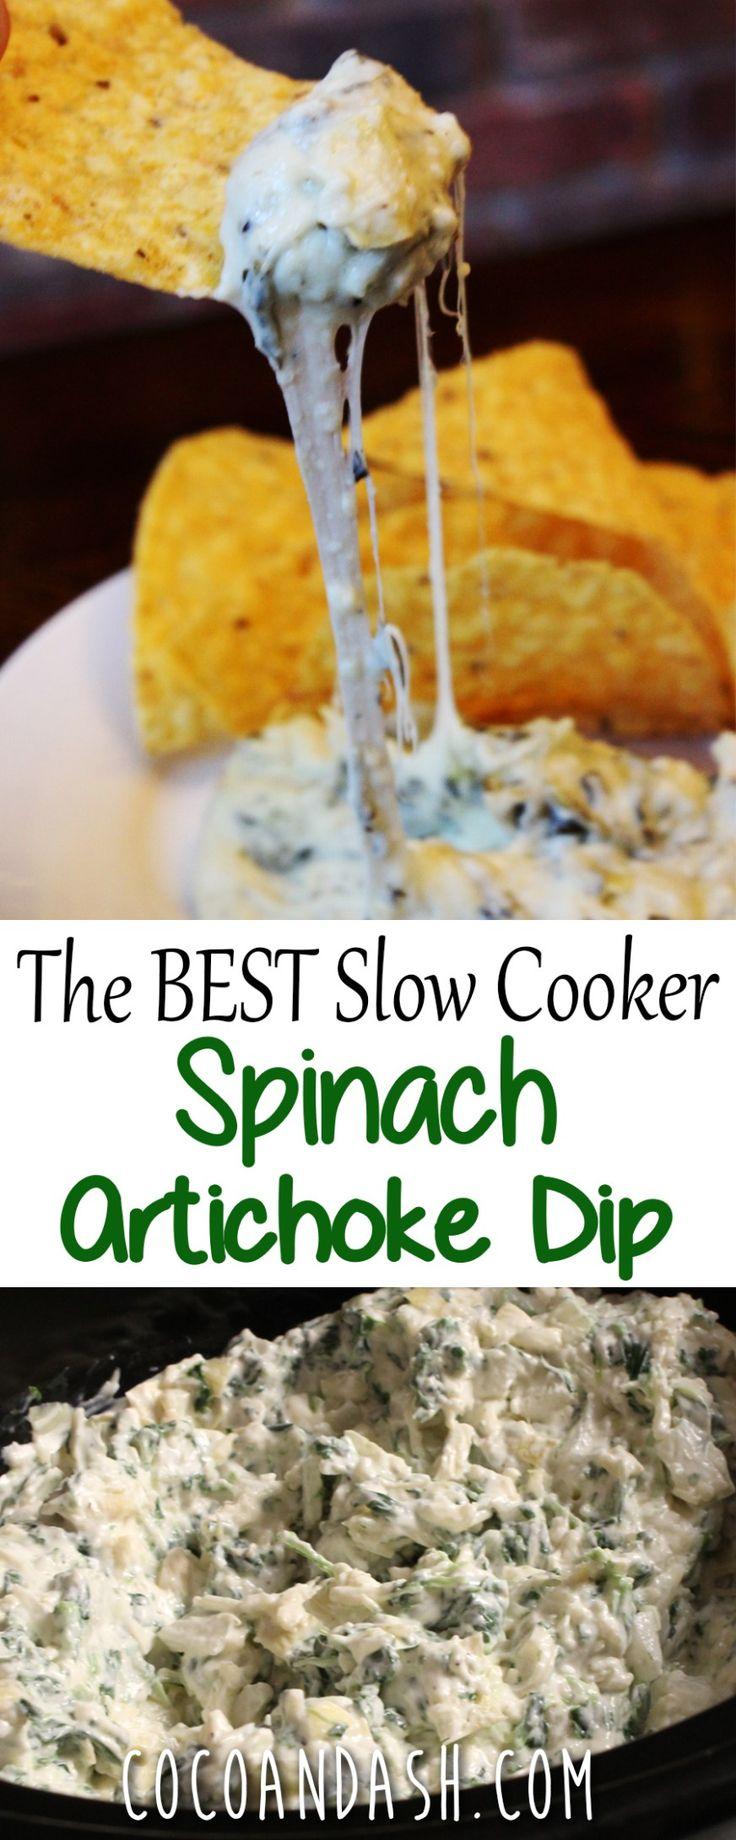 Slow cooker spinach artichoke dip- sub onion for 1 can green chilies. Didn't add mozzarella.